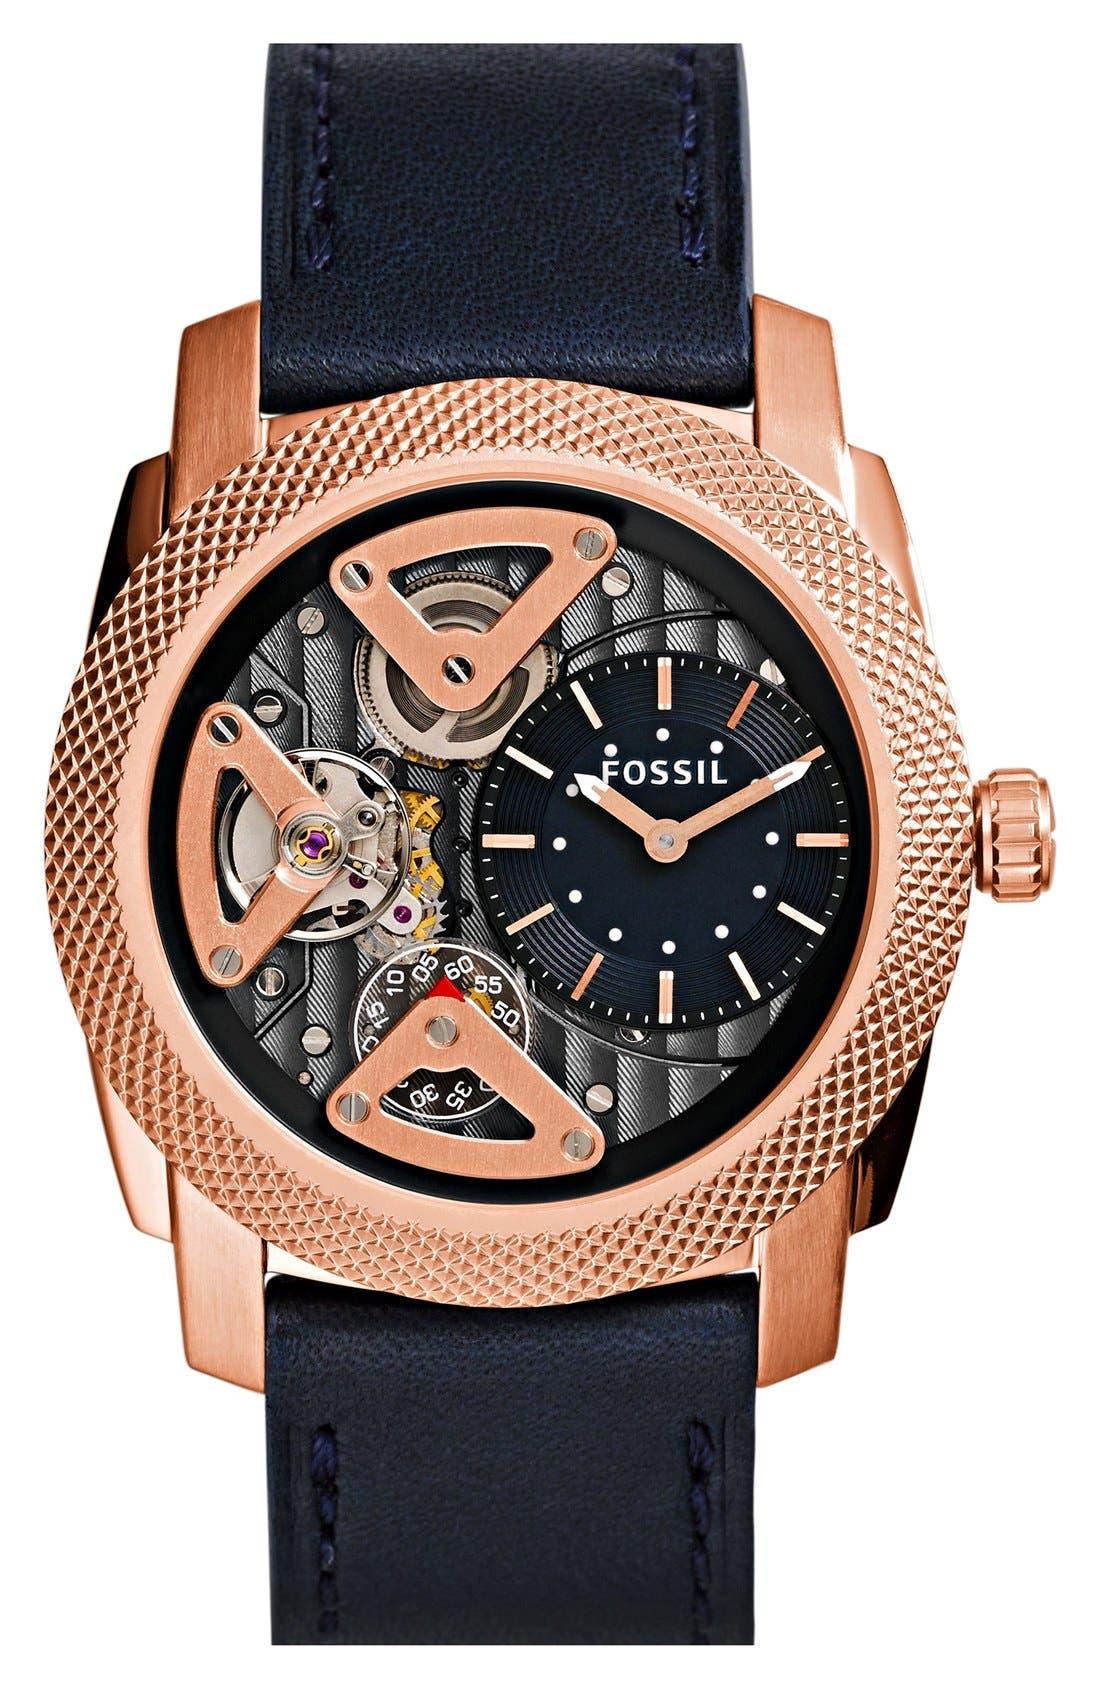 Main Image - Fossil 'Machine Twist' Leather Strap Watch, 45mm